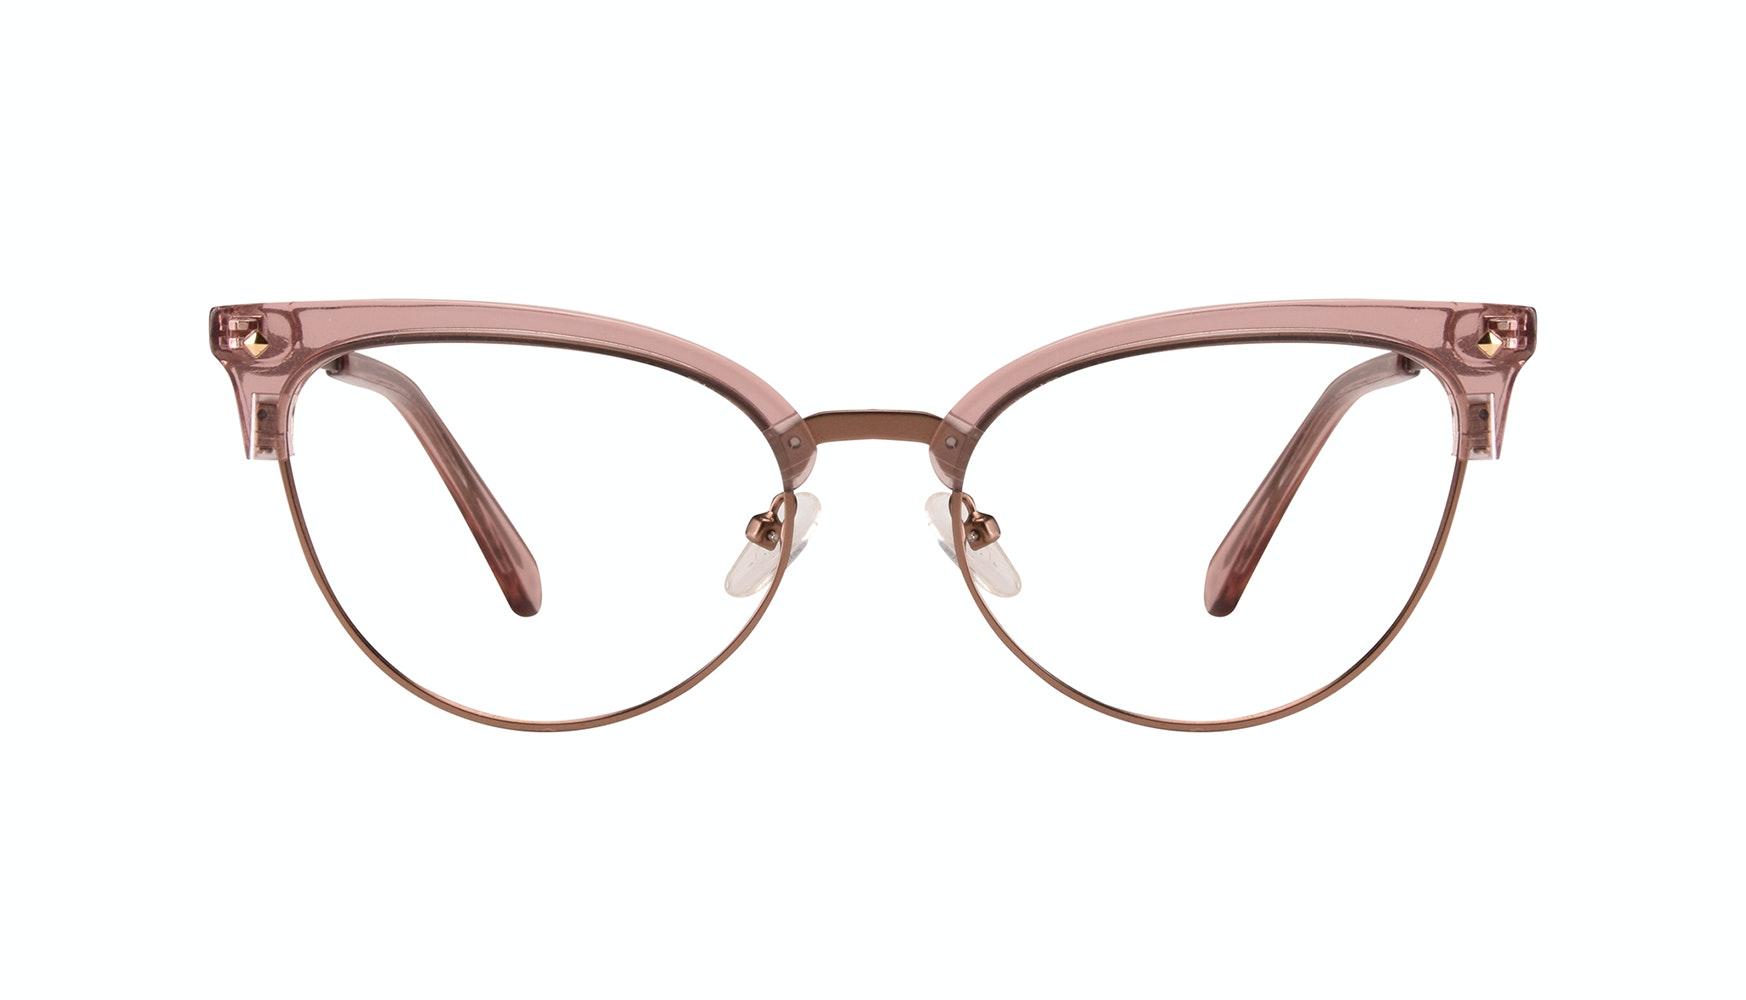 Affordable Fashion Glasses Cat Eye Daring Cateye Eyeglasses Women Moon Rose Front